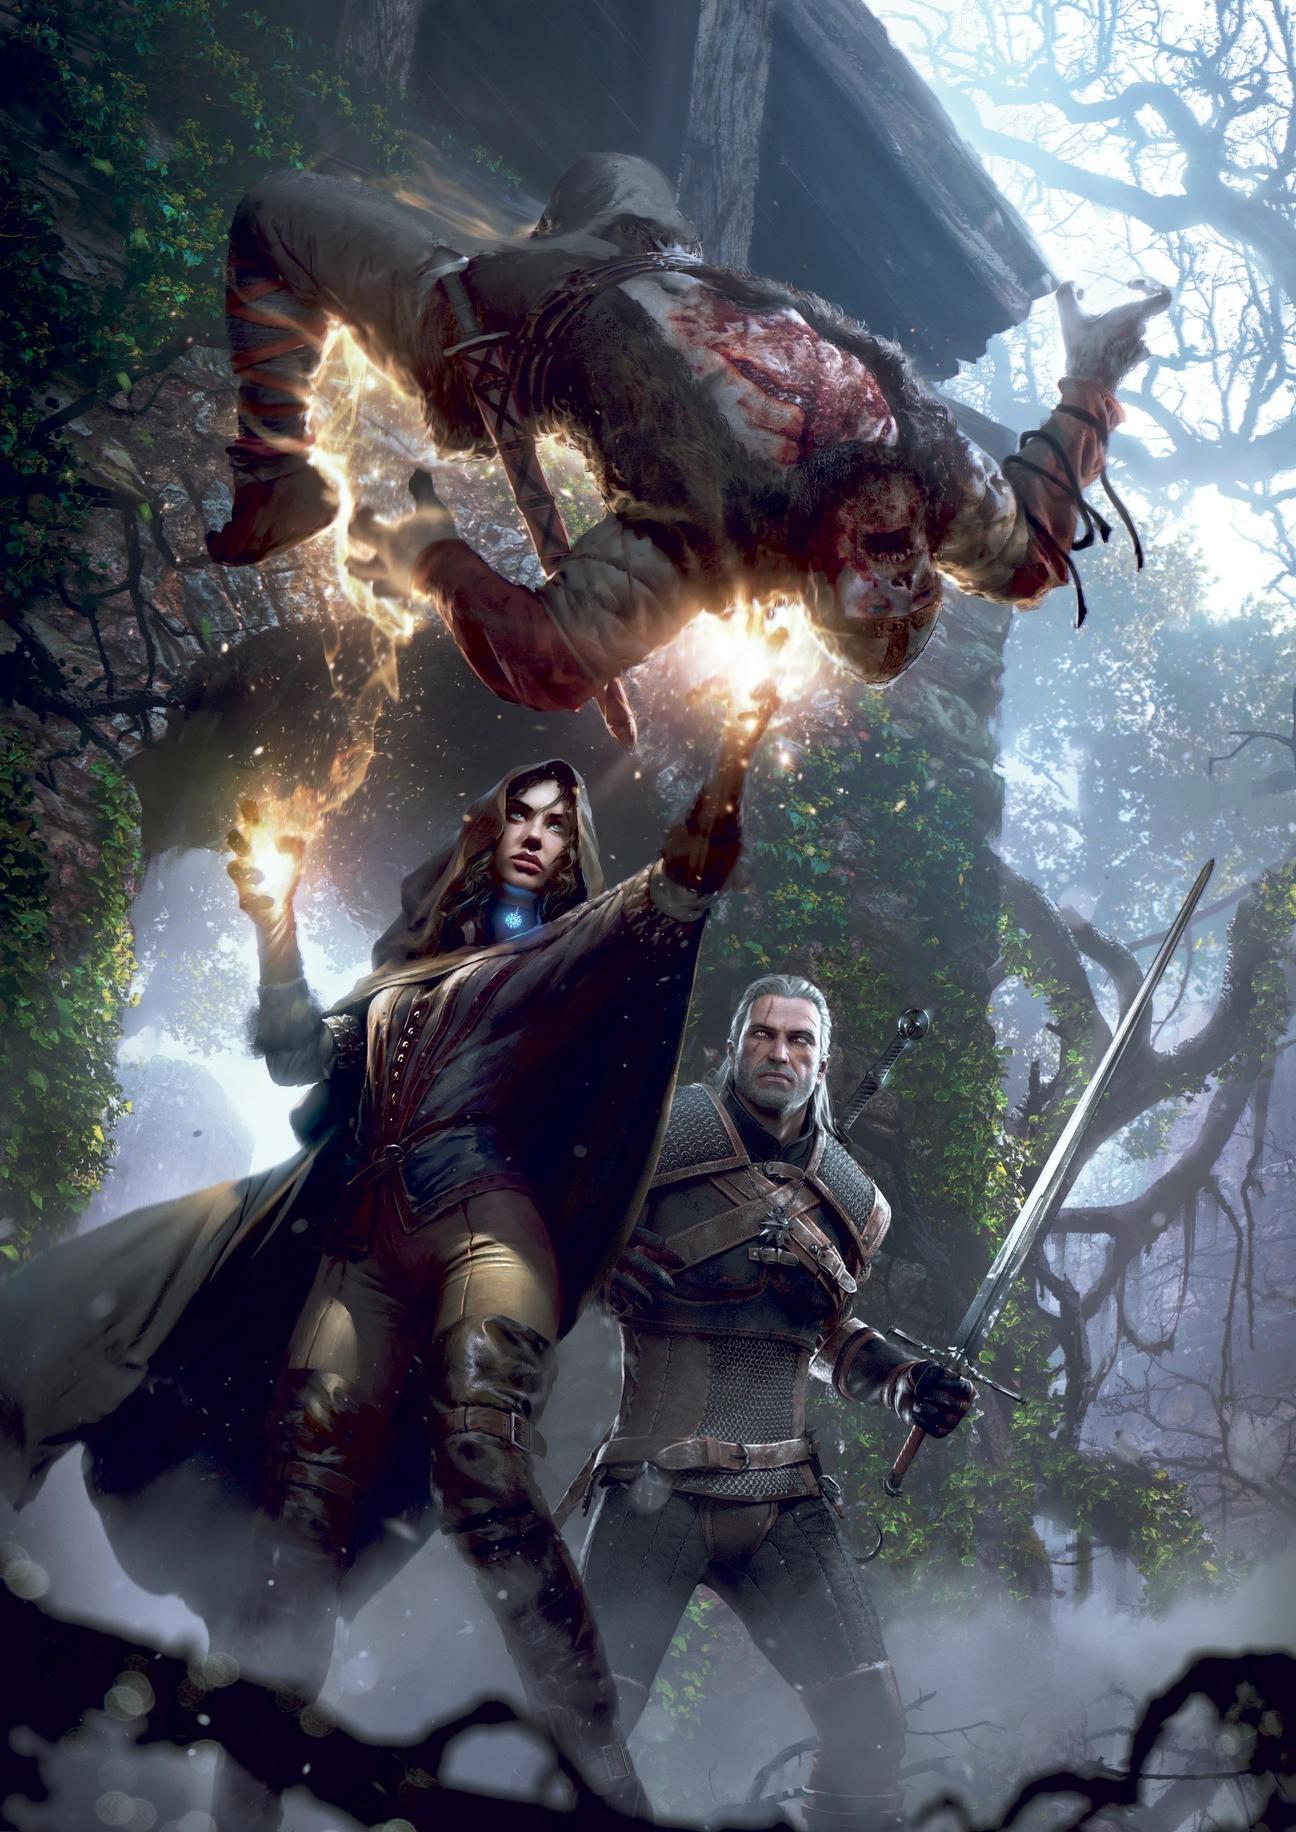 Wallpaper 1296x1832 Px Geralt Of Rivia The Witcher 3 Wild Hunt